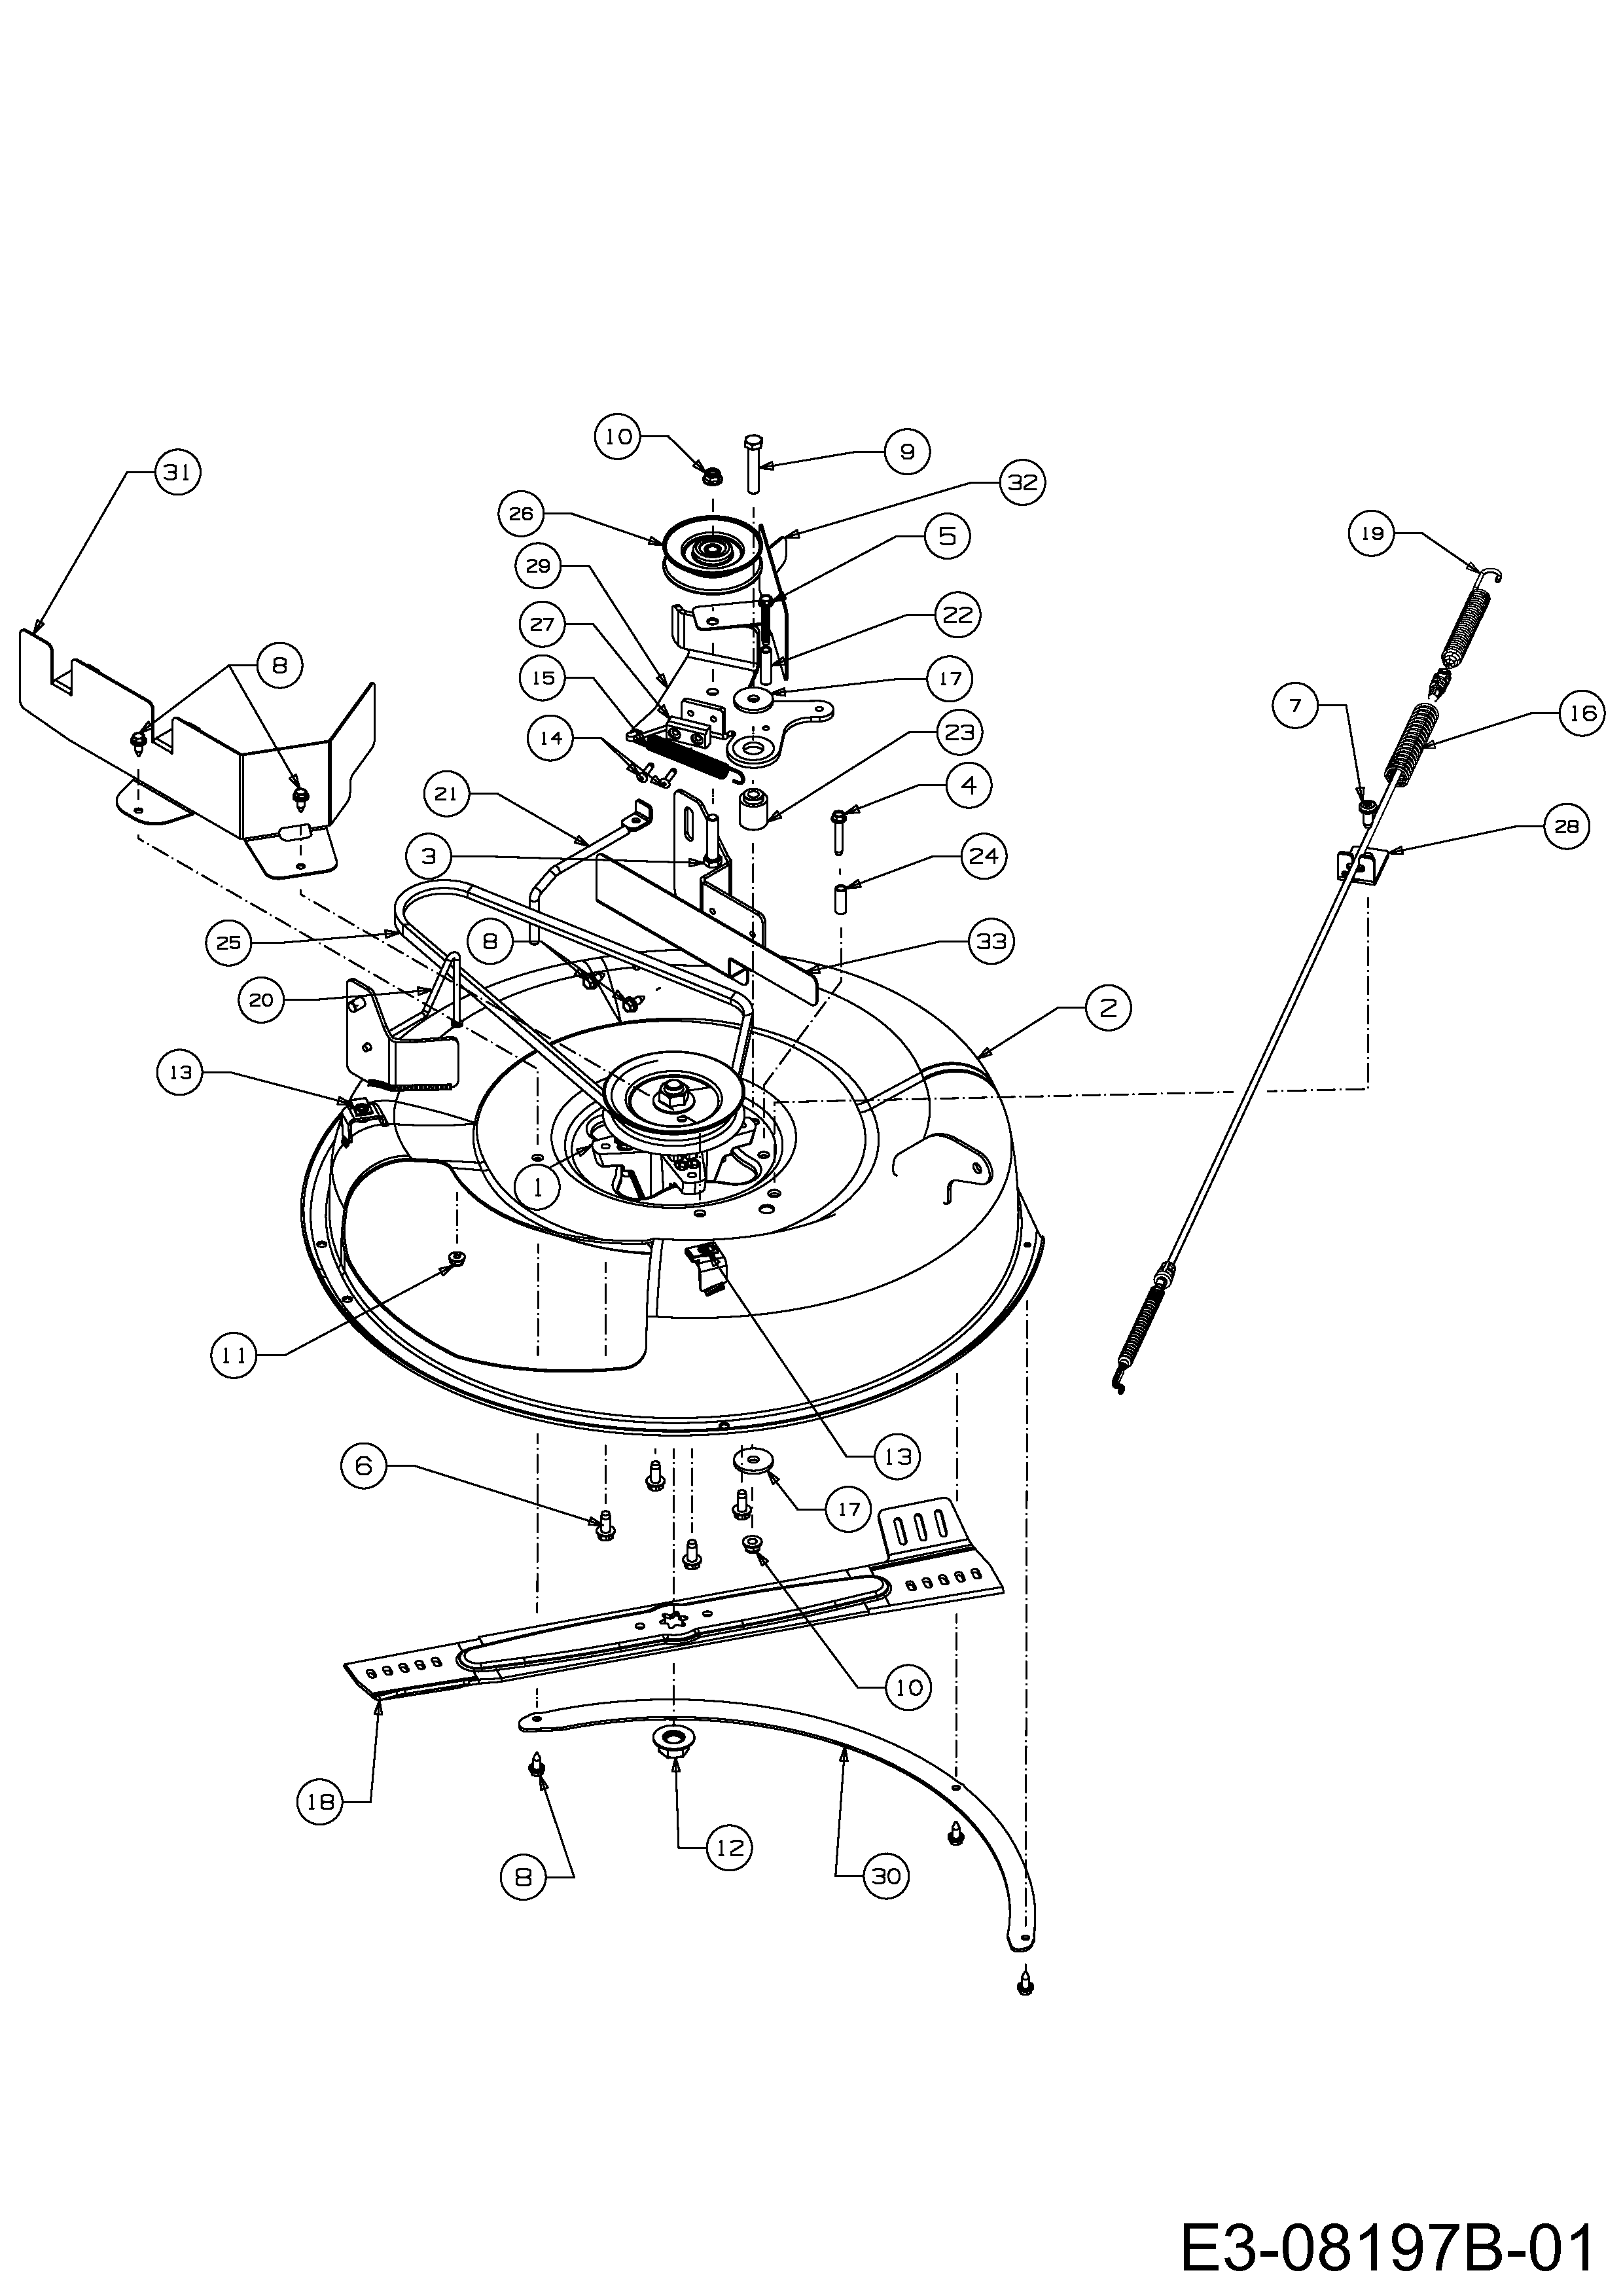 m hwerk c 24 60cm 13a326ec650 2014 scooter mini rasentraktoren wolf garten. Black Bedroom Furniture Sets. Home Design Ideas